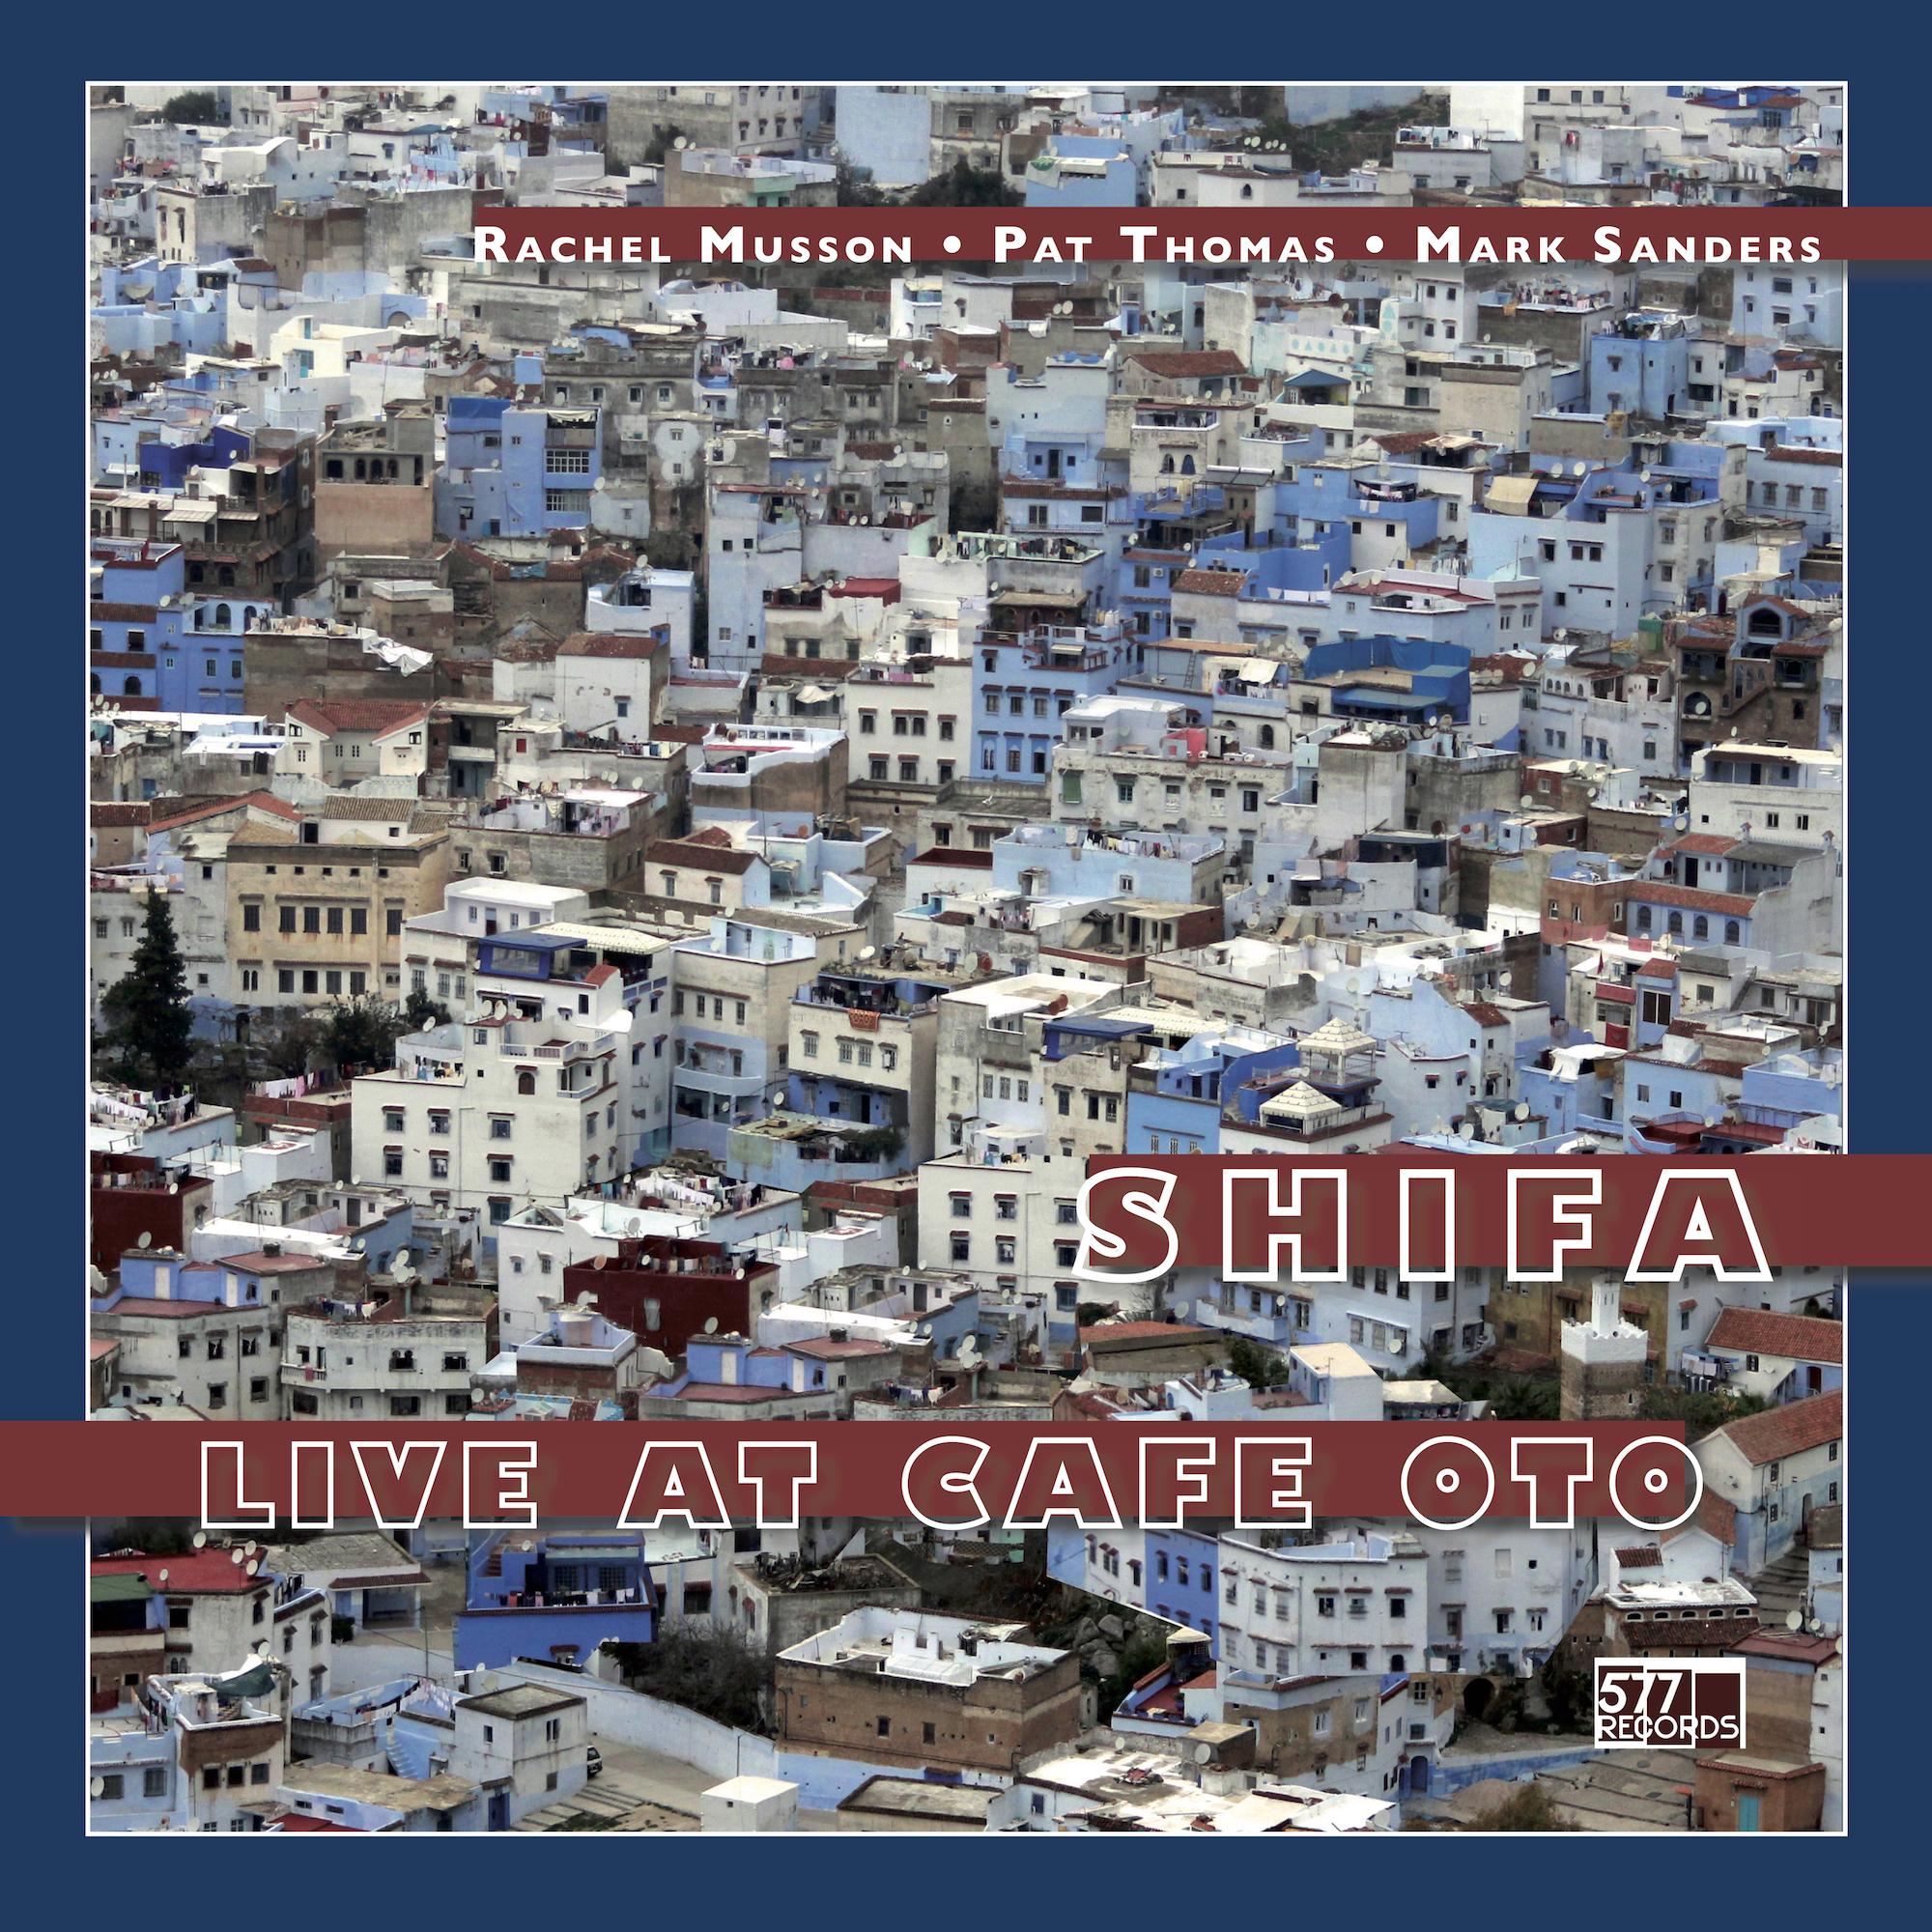 5823 SHIFA COVER.jpg